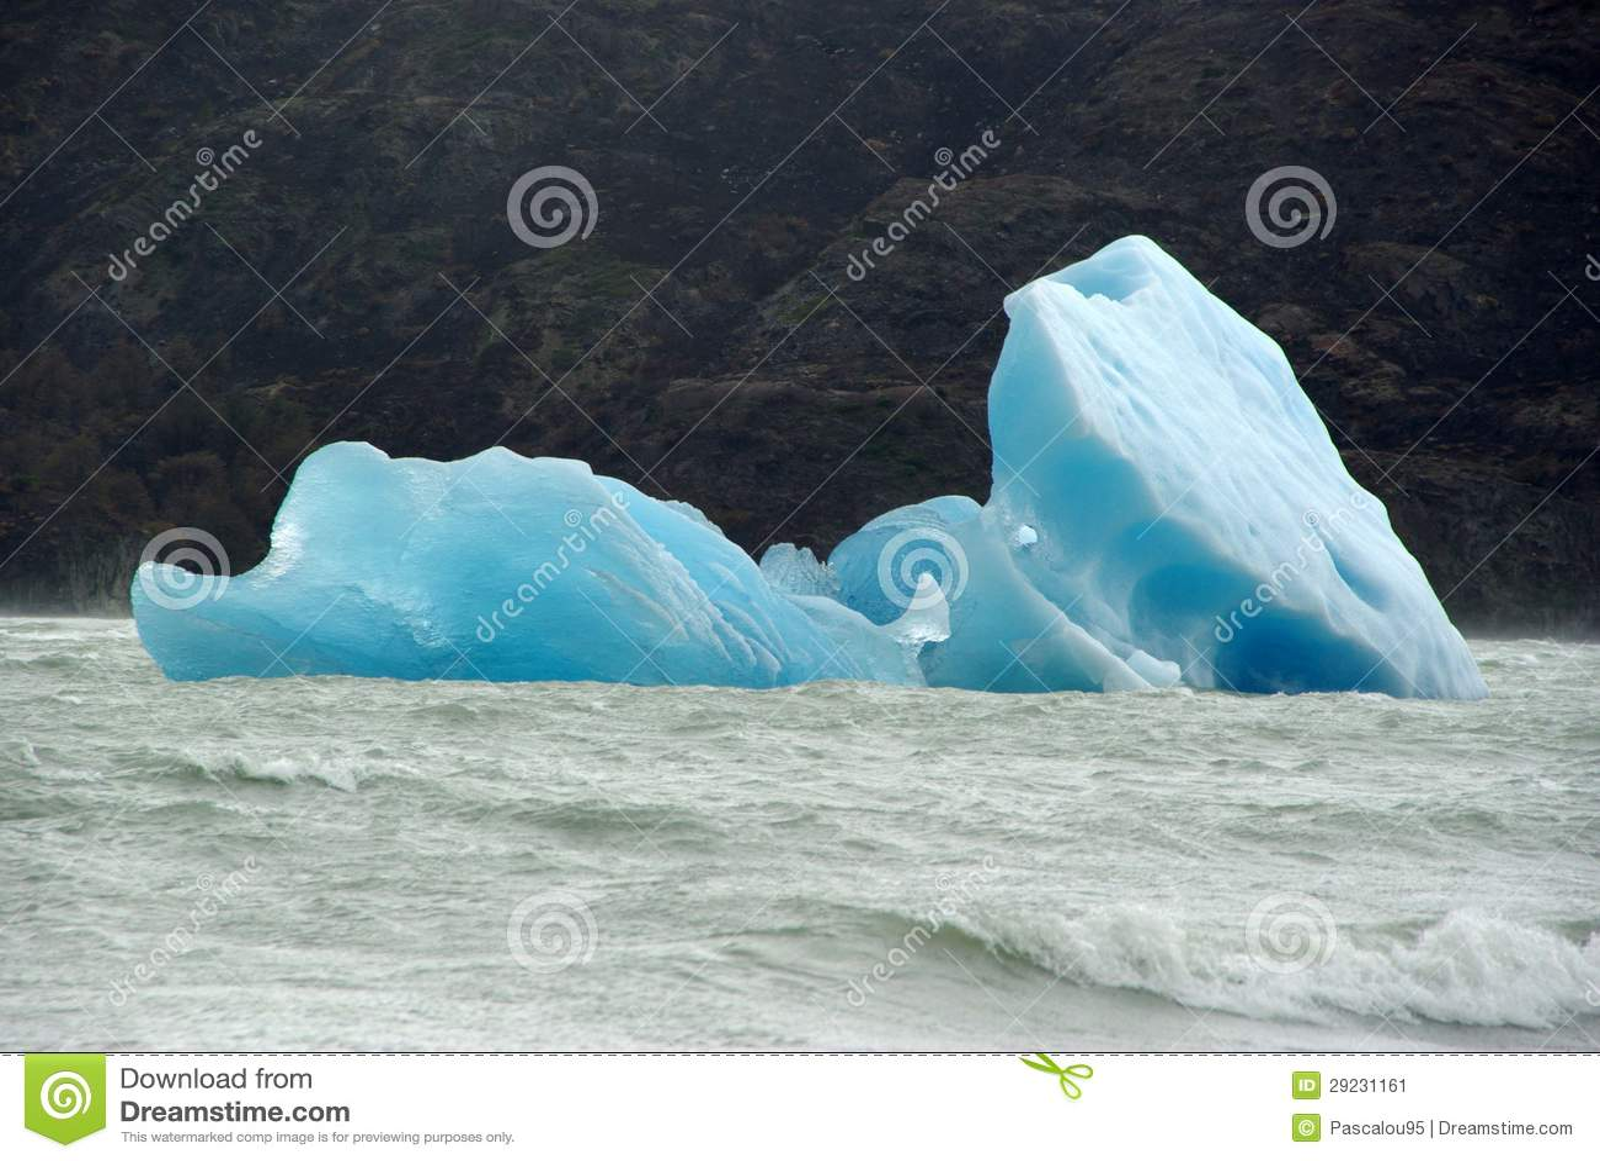 Download Iceberg, o Chile imagem de stock. Imagem de thawing, nave - 29231161